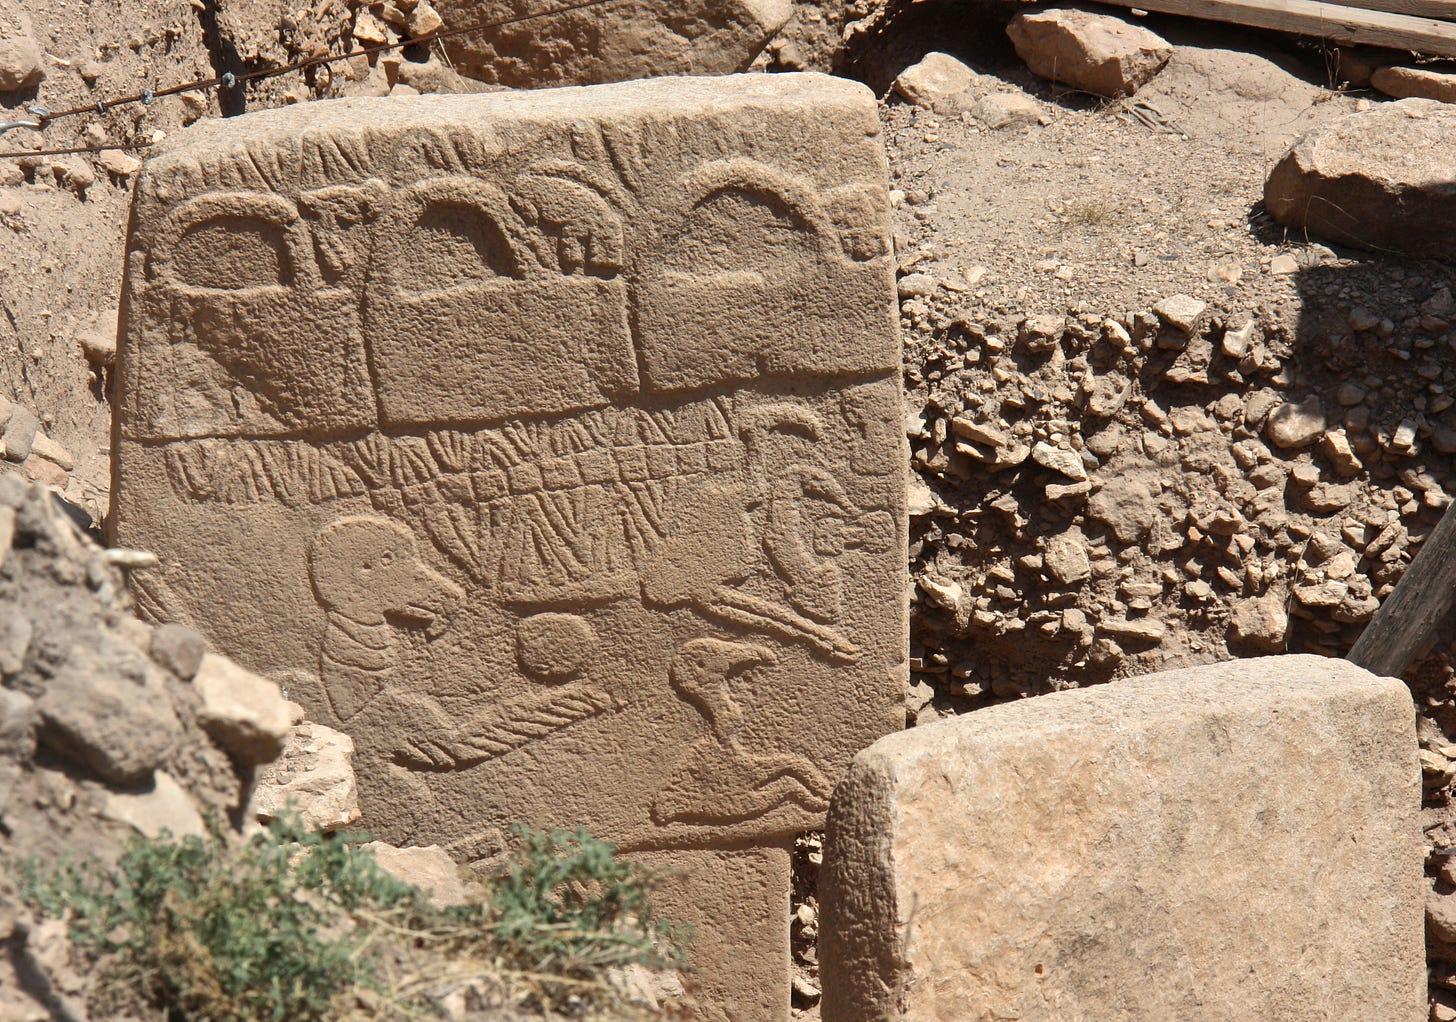 File:Vulture Stone, Gobekli Tepe, Sanliurfa, South-east Anatolia,  Turkey.jpg - Wikimedia Commons